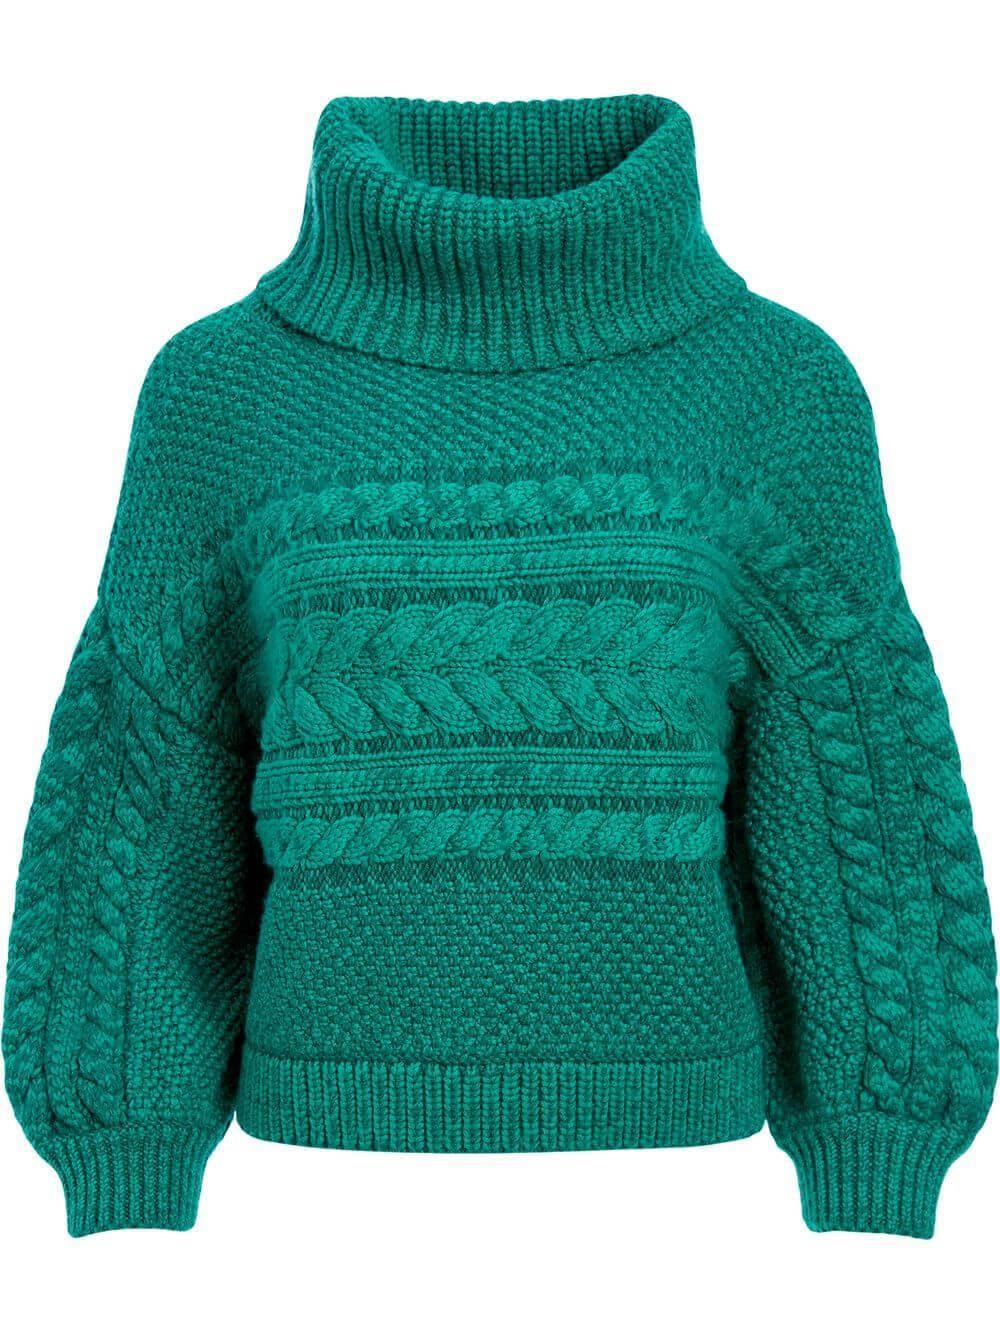 Franchie Turtleneck Sweater Item # CC009S36707